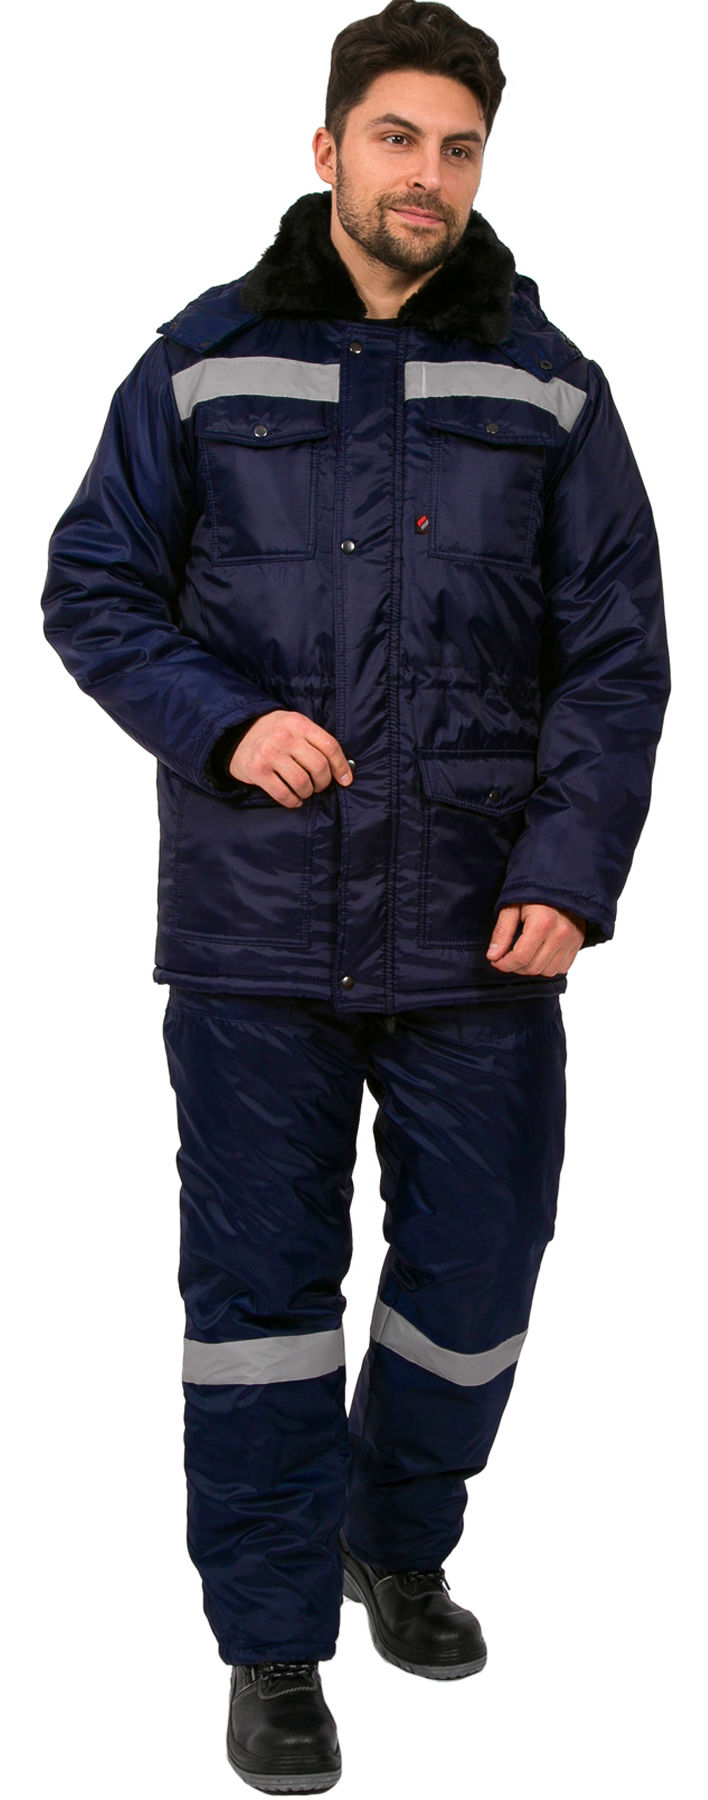 Костюм зимний мужской Мастер (тк.Оксфорд) п/к, т.синий